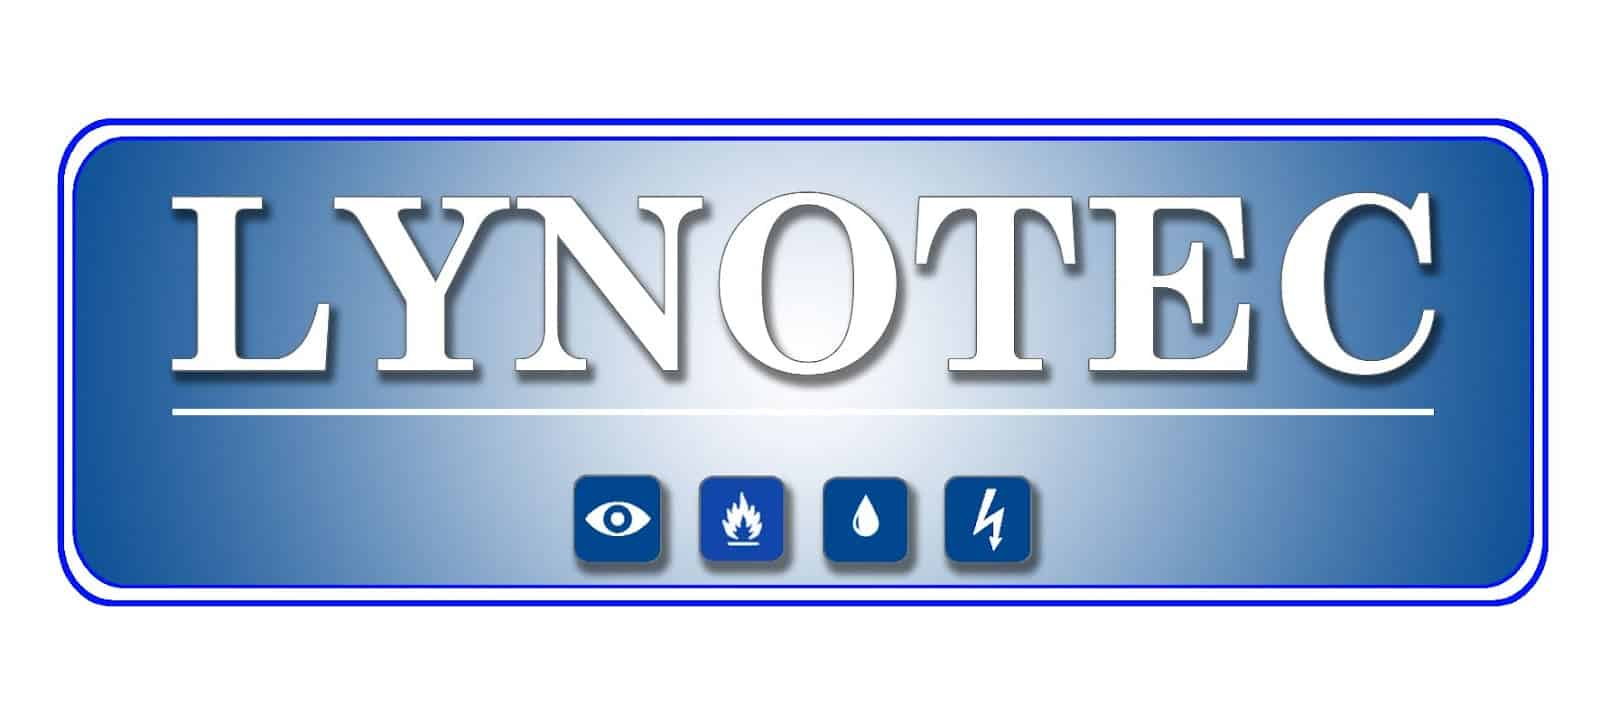 Lynotec